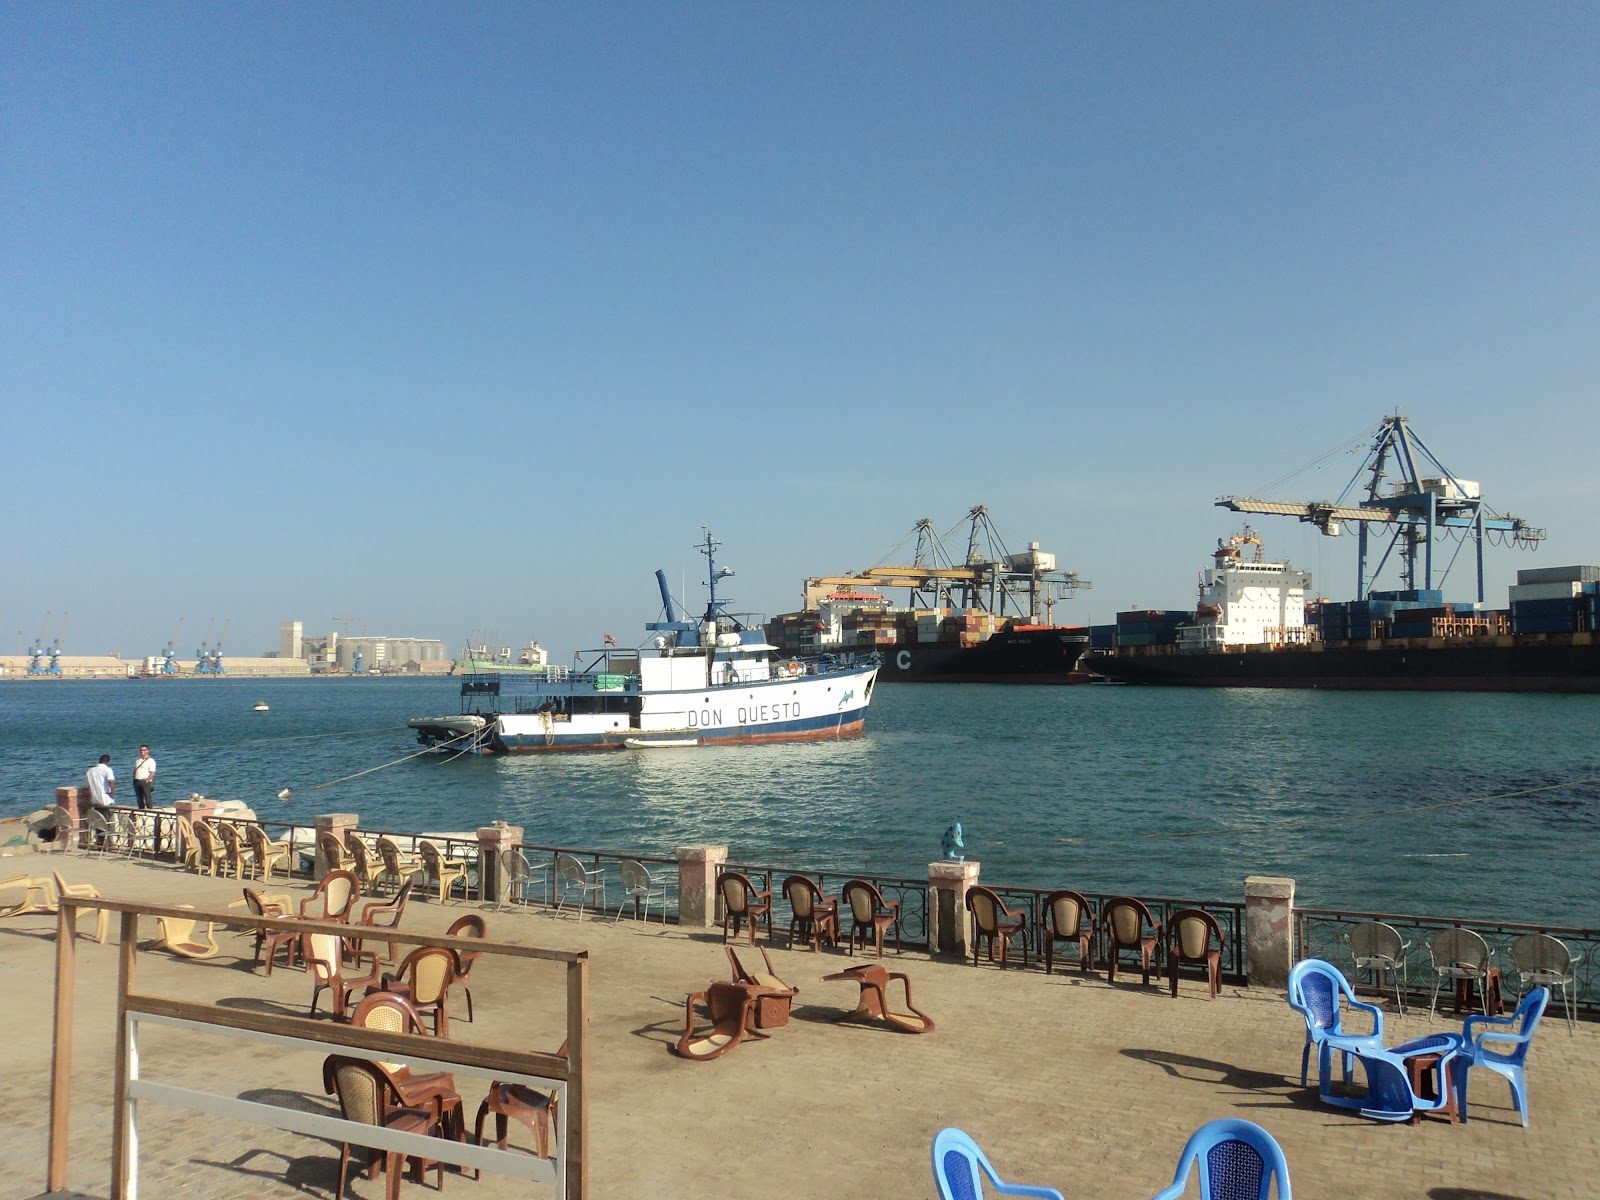 A teachers life in Khartoum: A week in Port Sudan